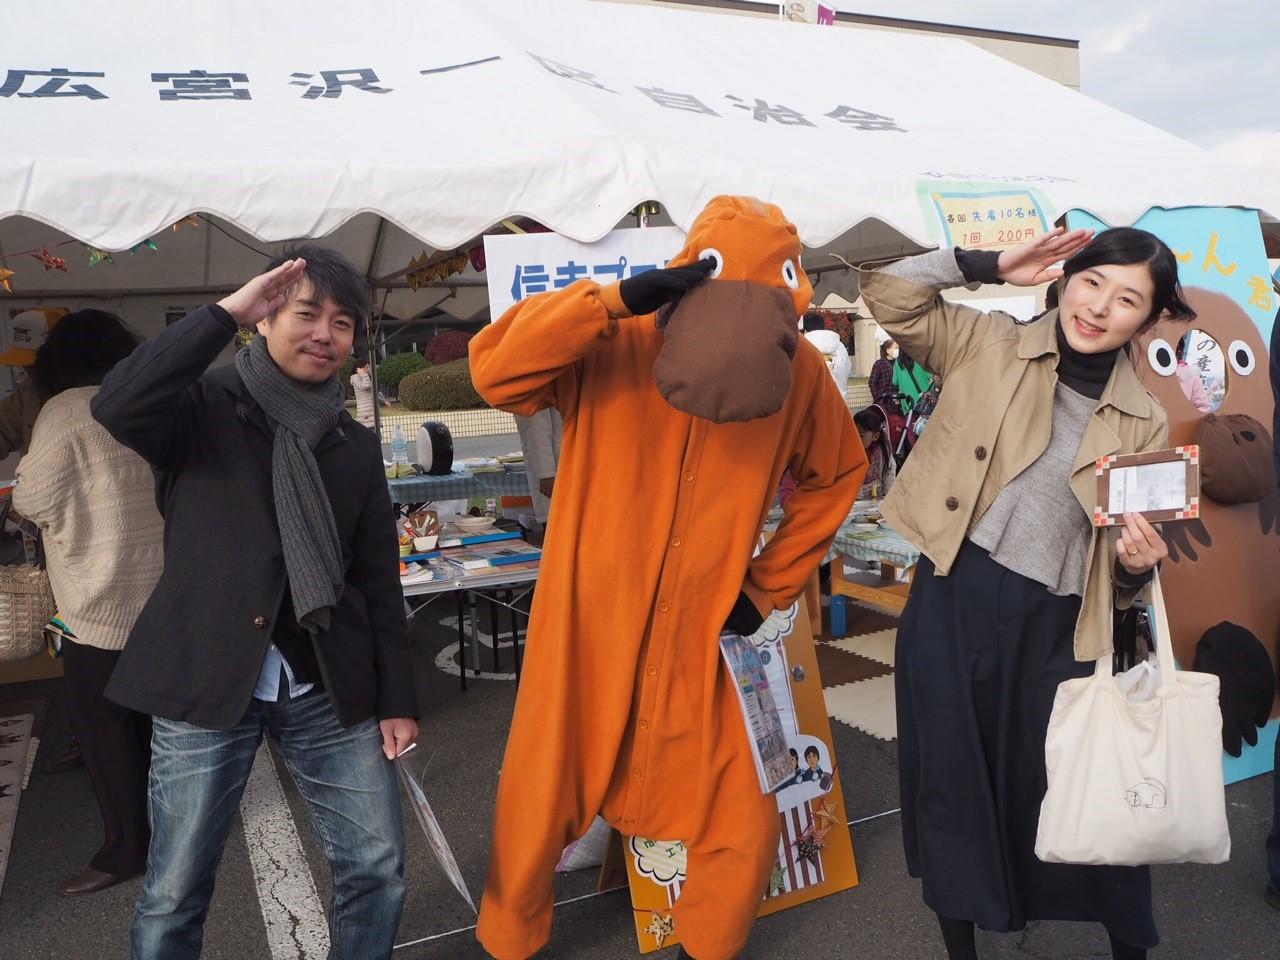 2015.10.31お客様感謝祭1日目_1372.jpg